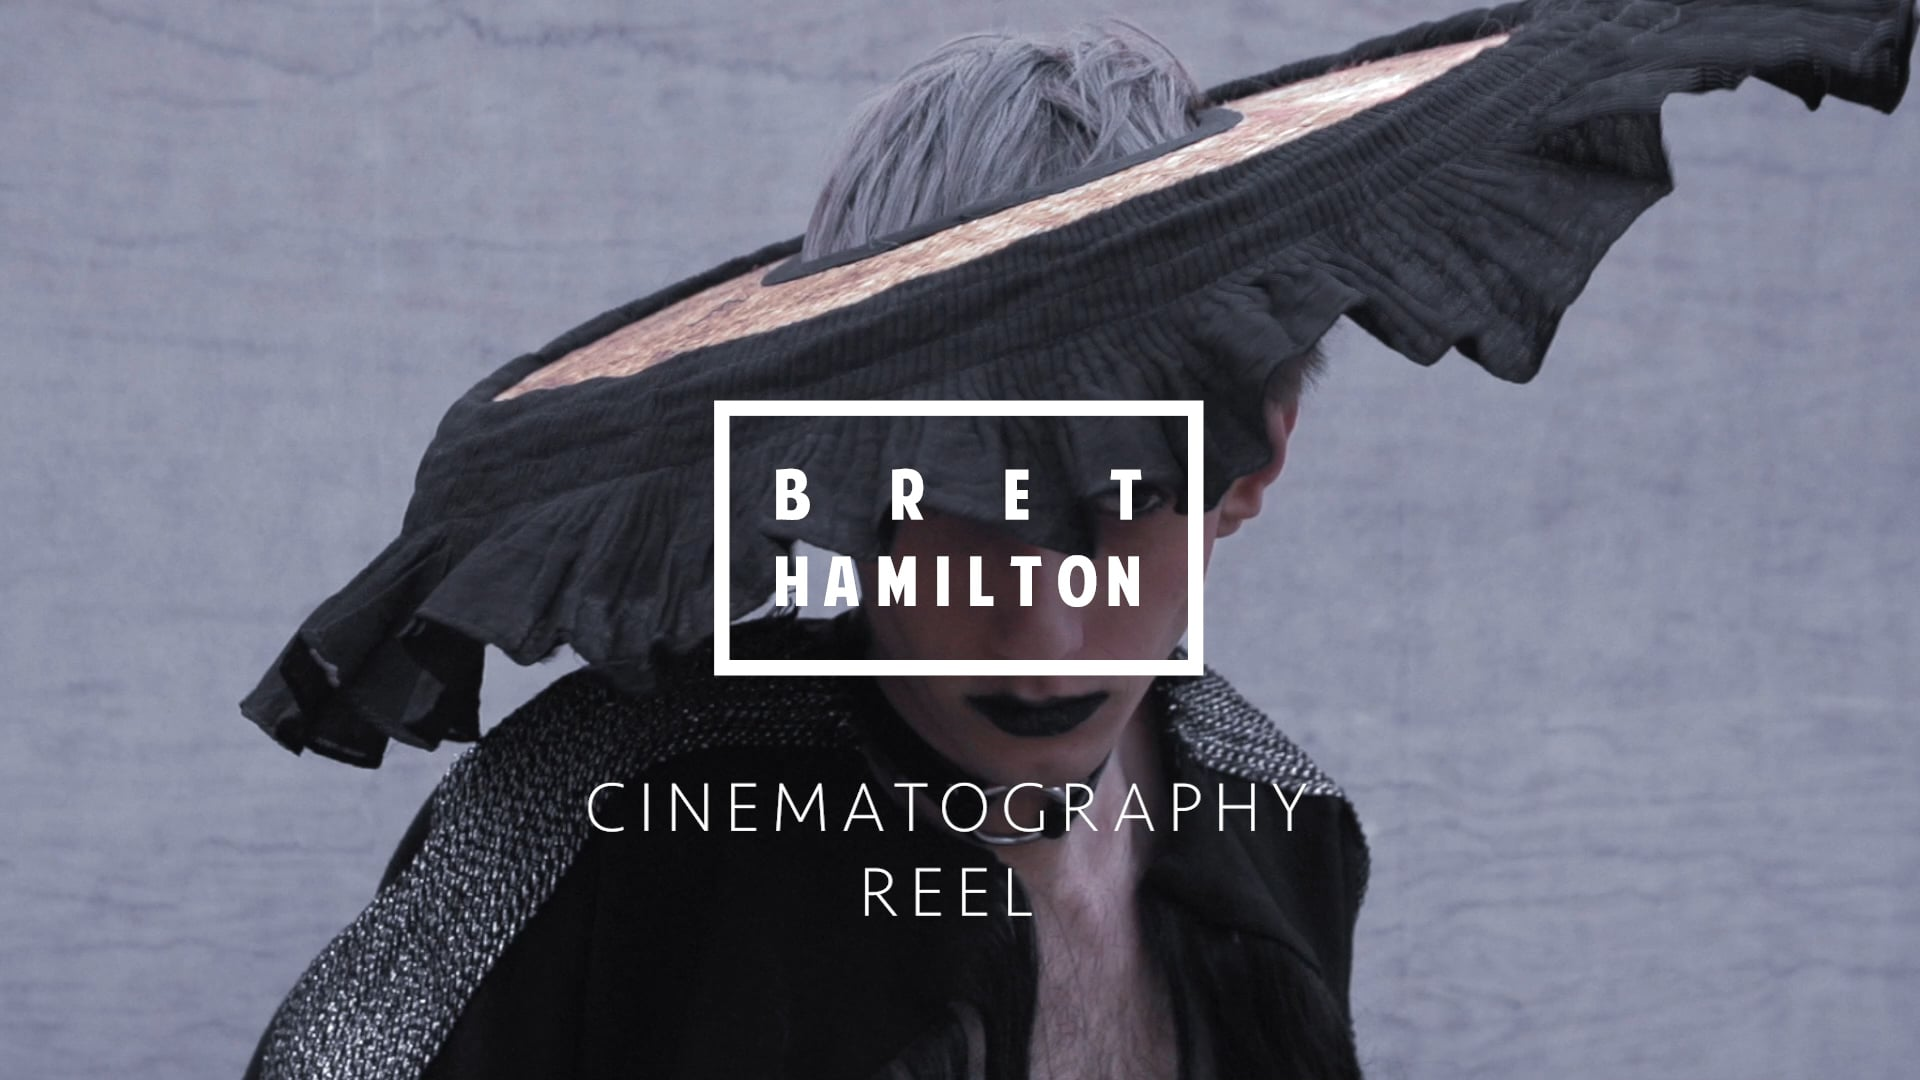 Narrative / MV Cinematography Reel